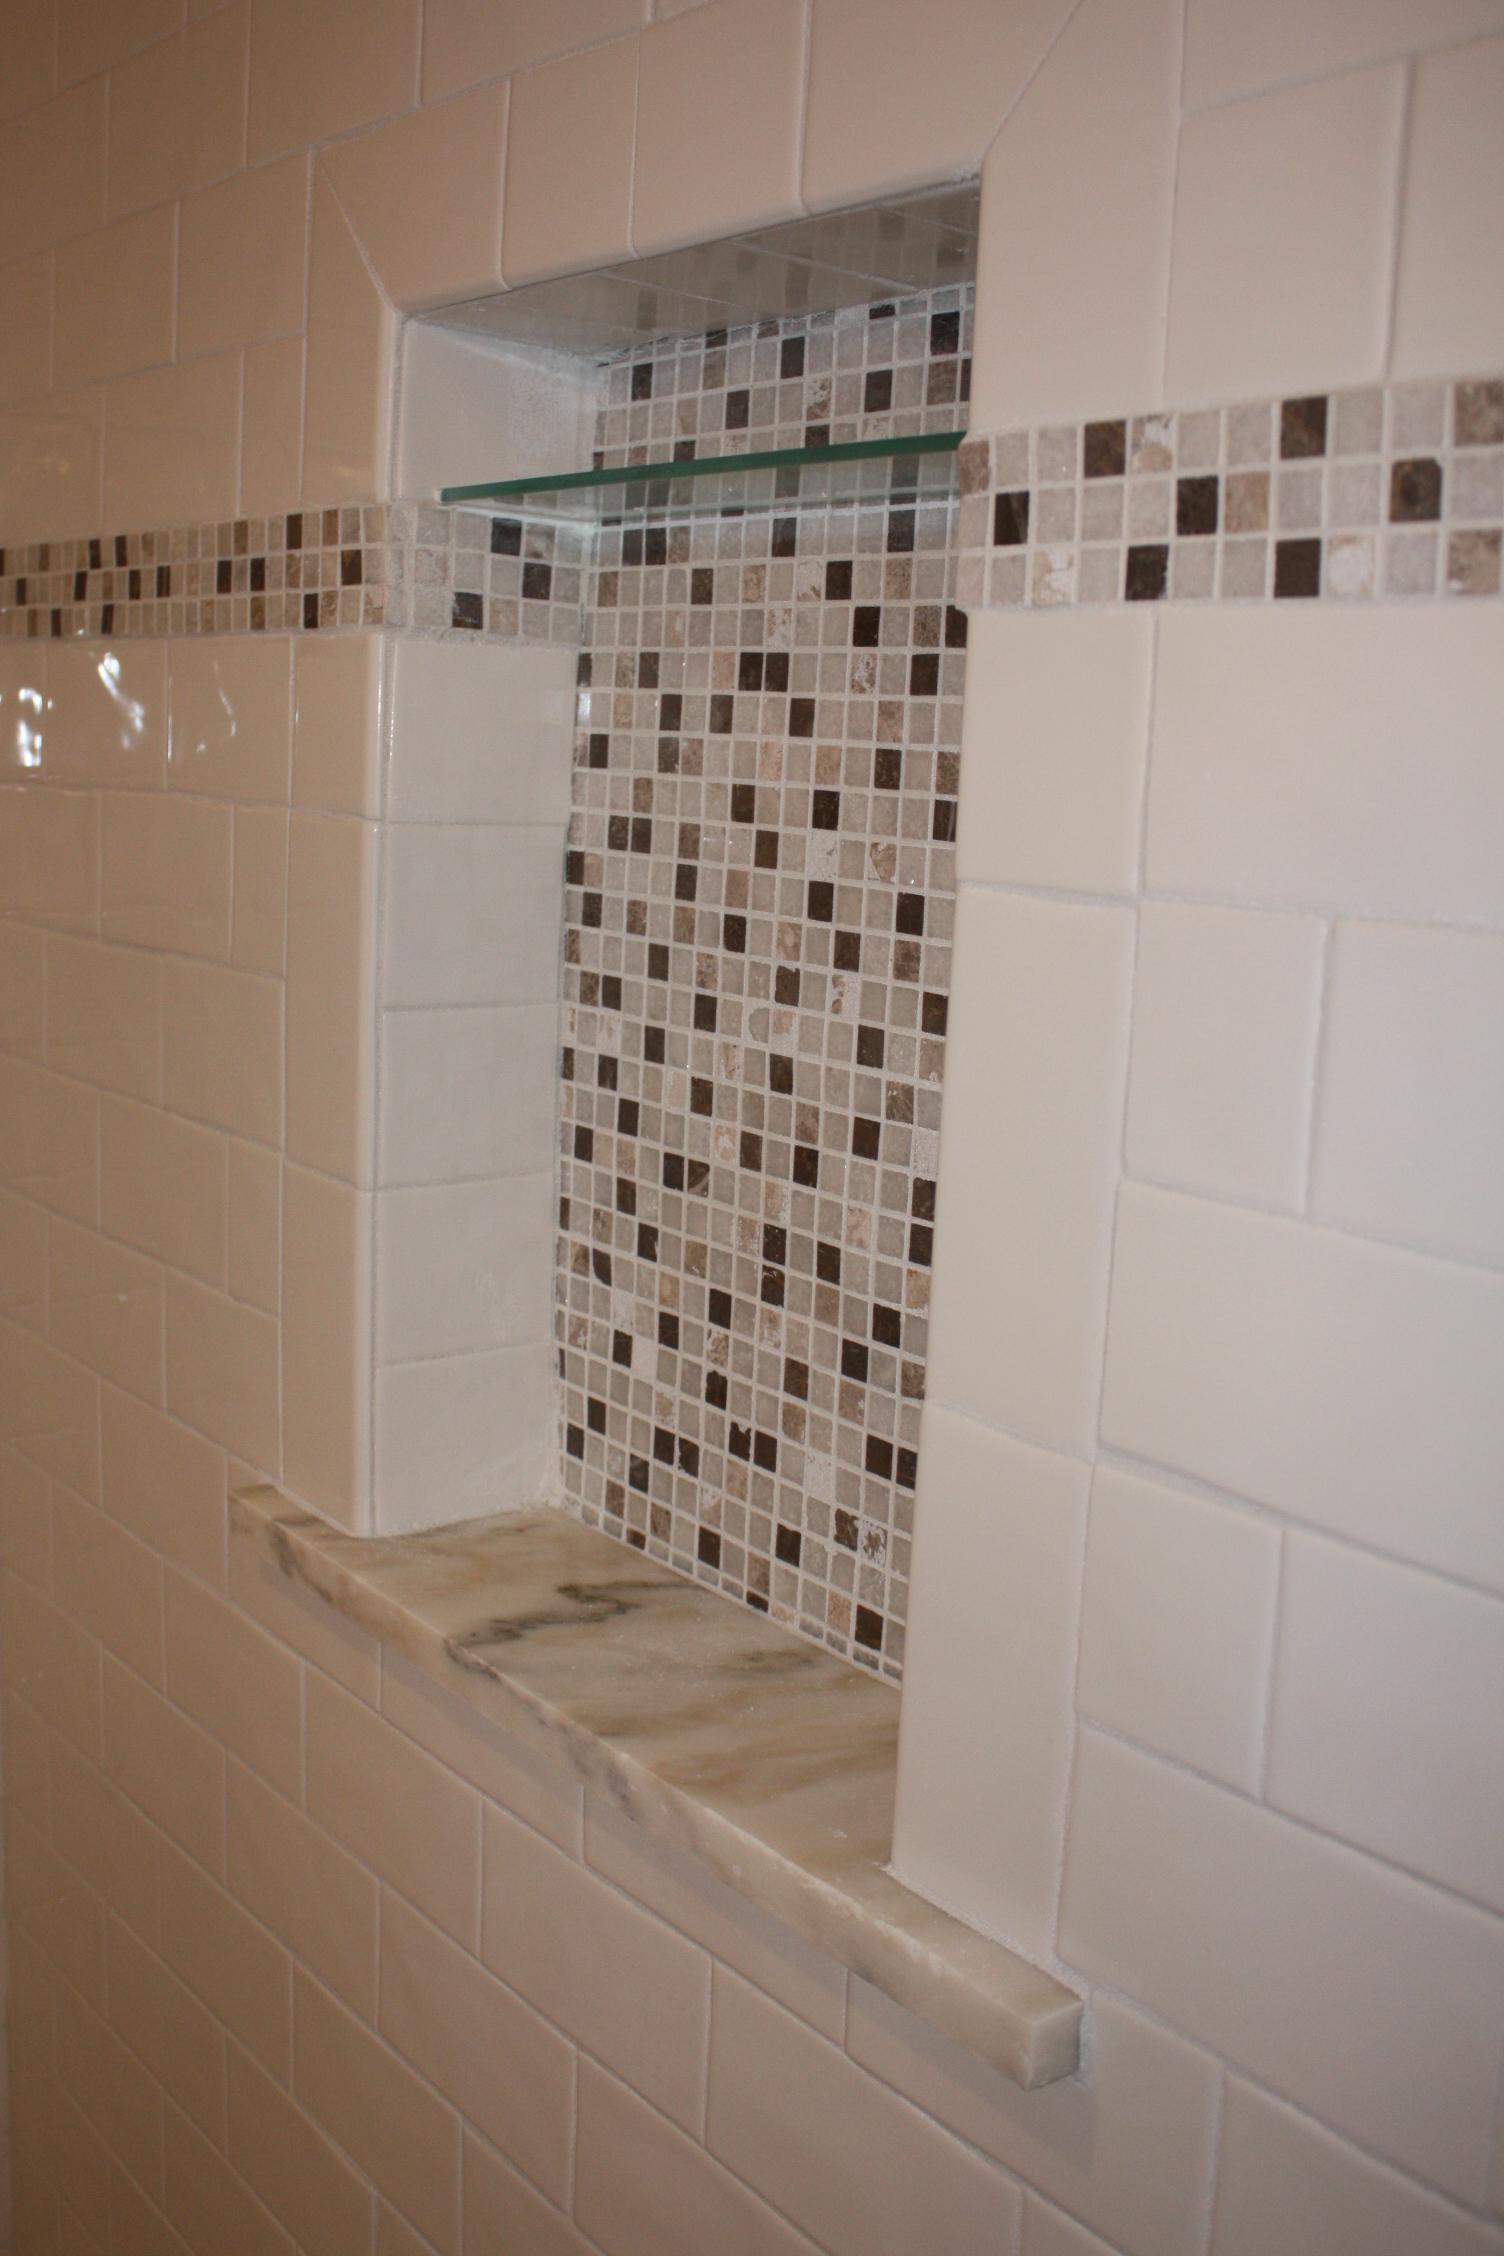 cvisions_bathroom_remodel18.JPG